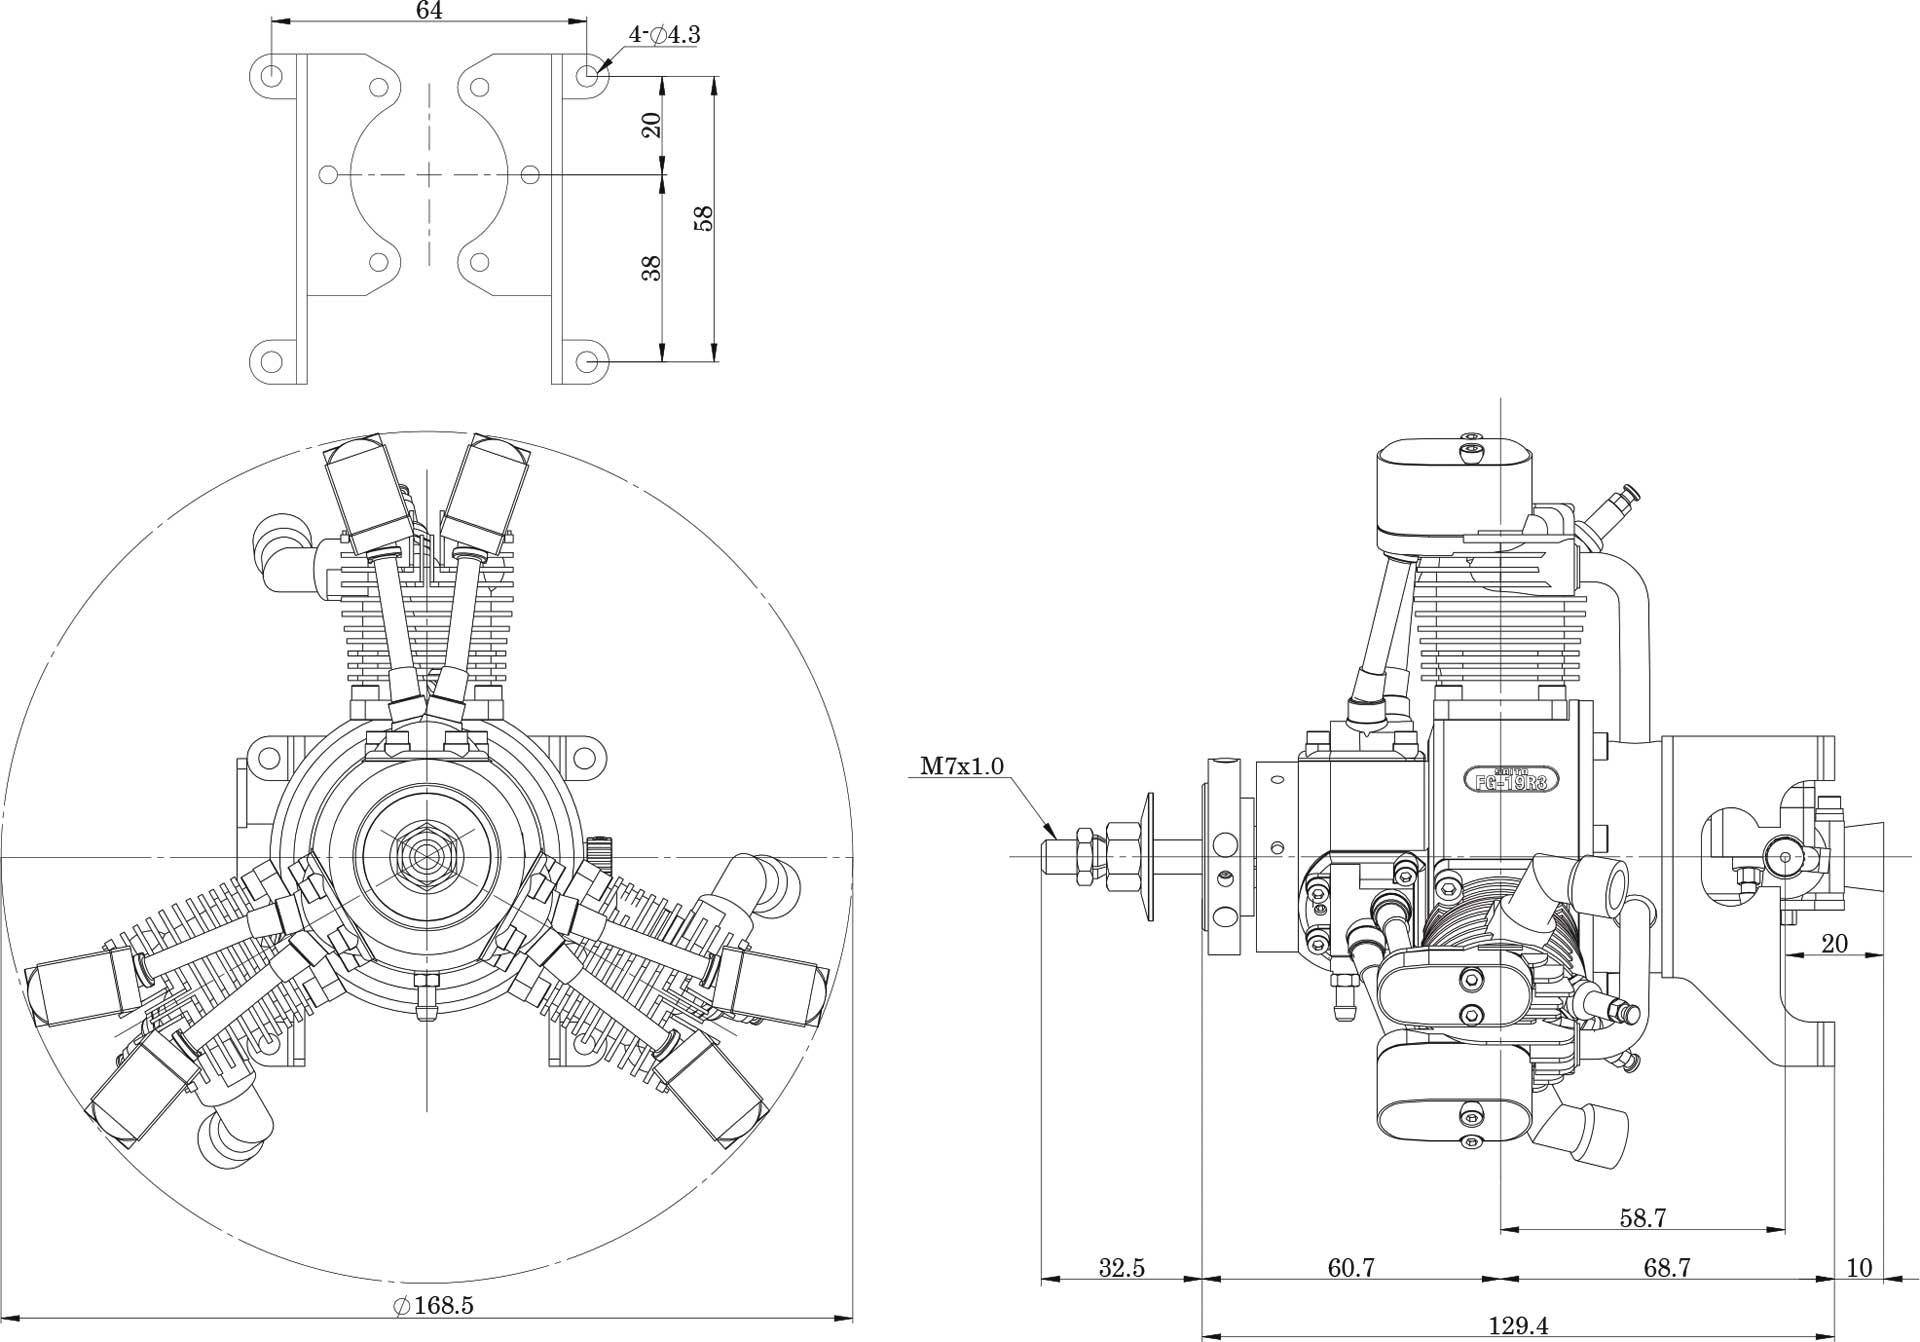 SAITO FG-19R3 BENZIN STERNMOTOR 3-ZYLINDER